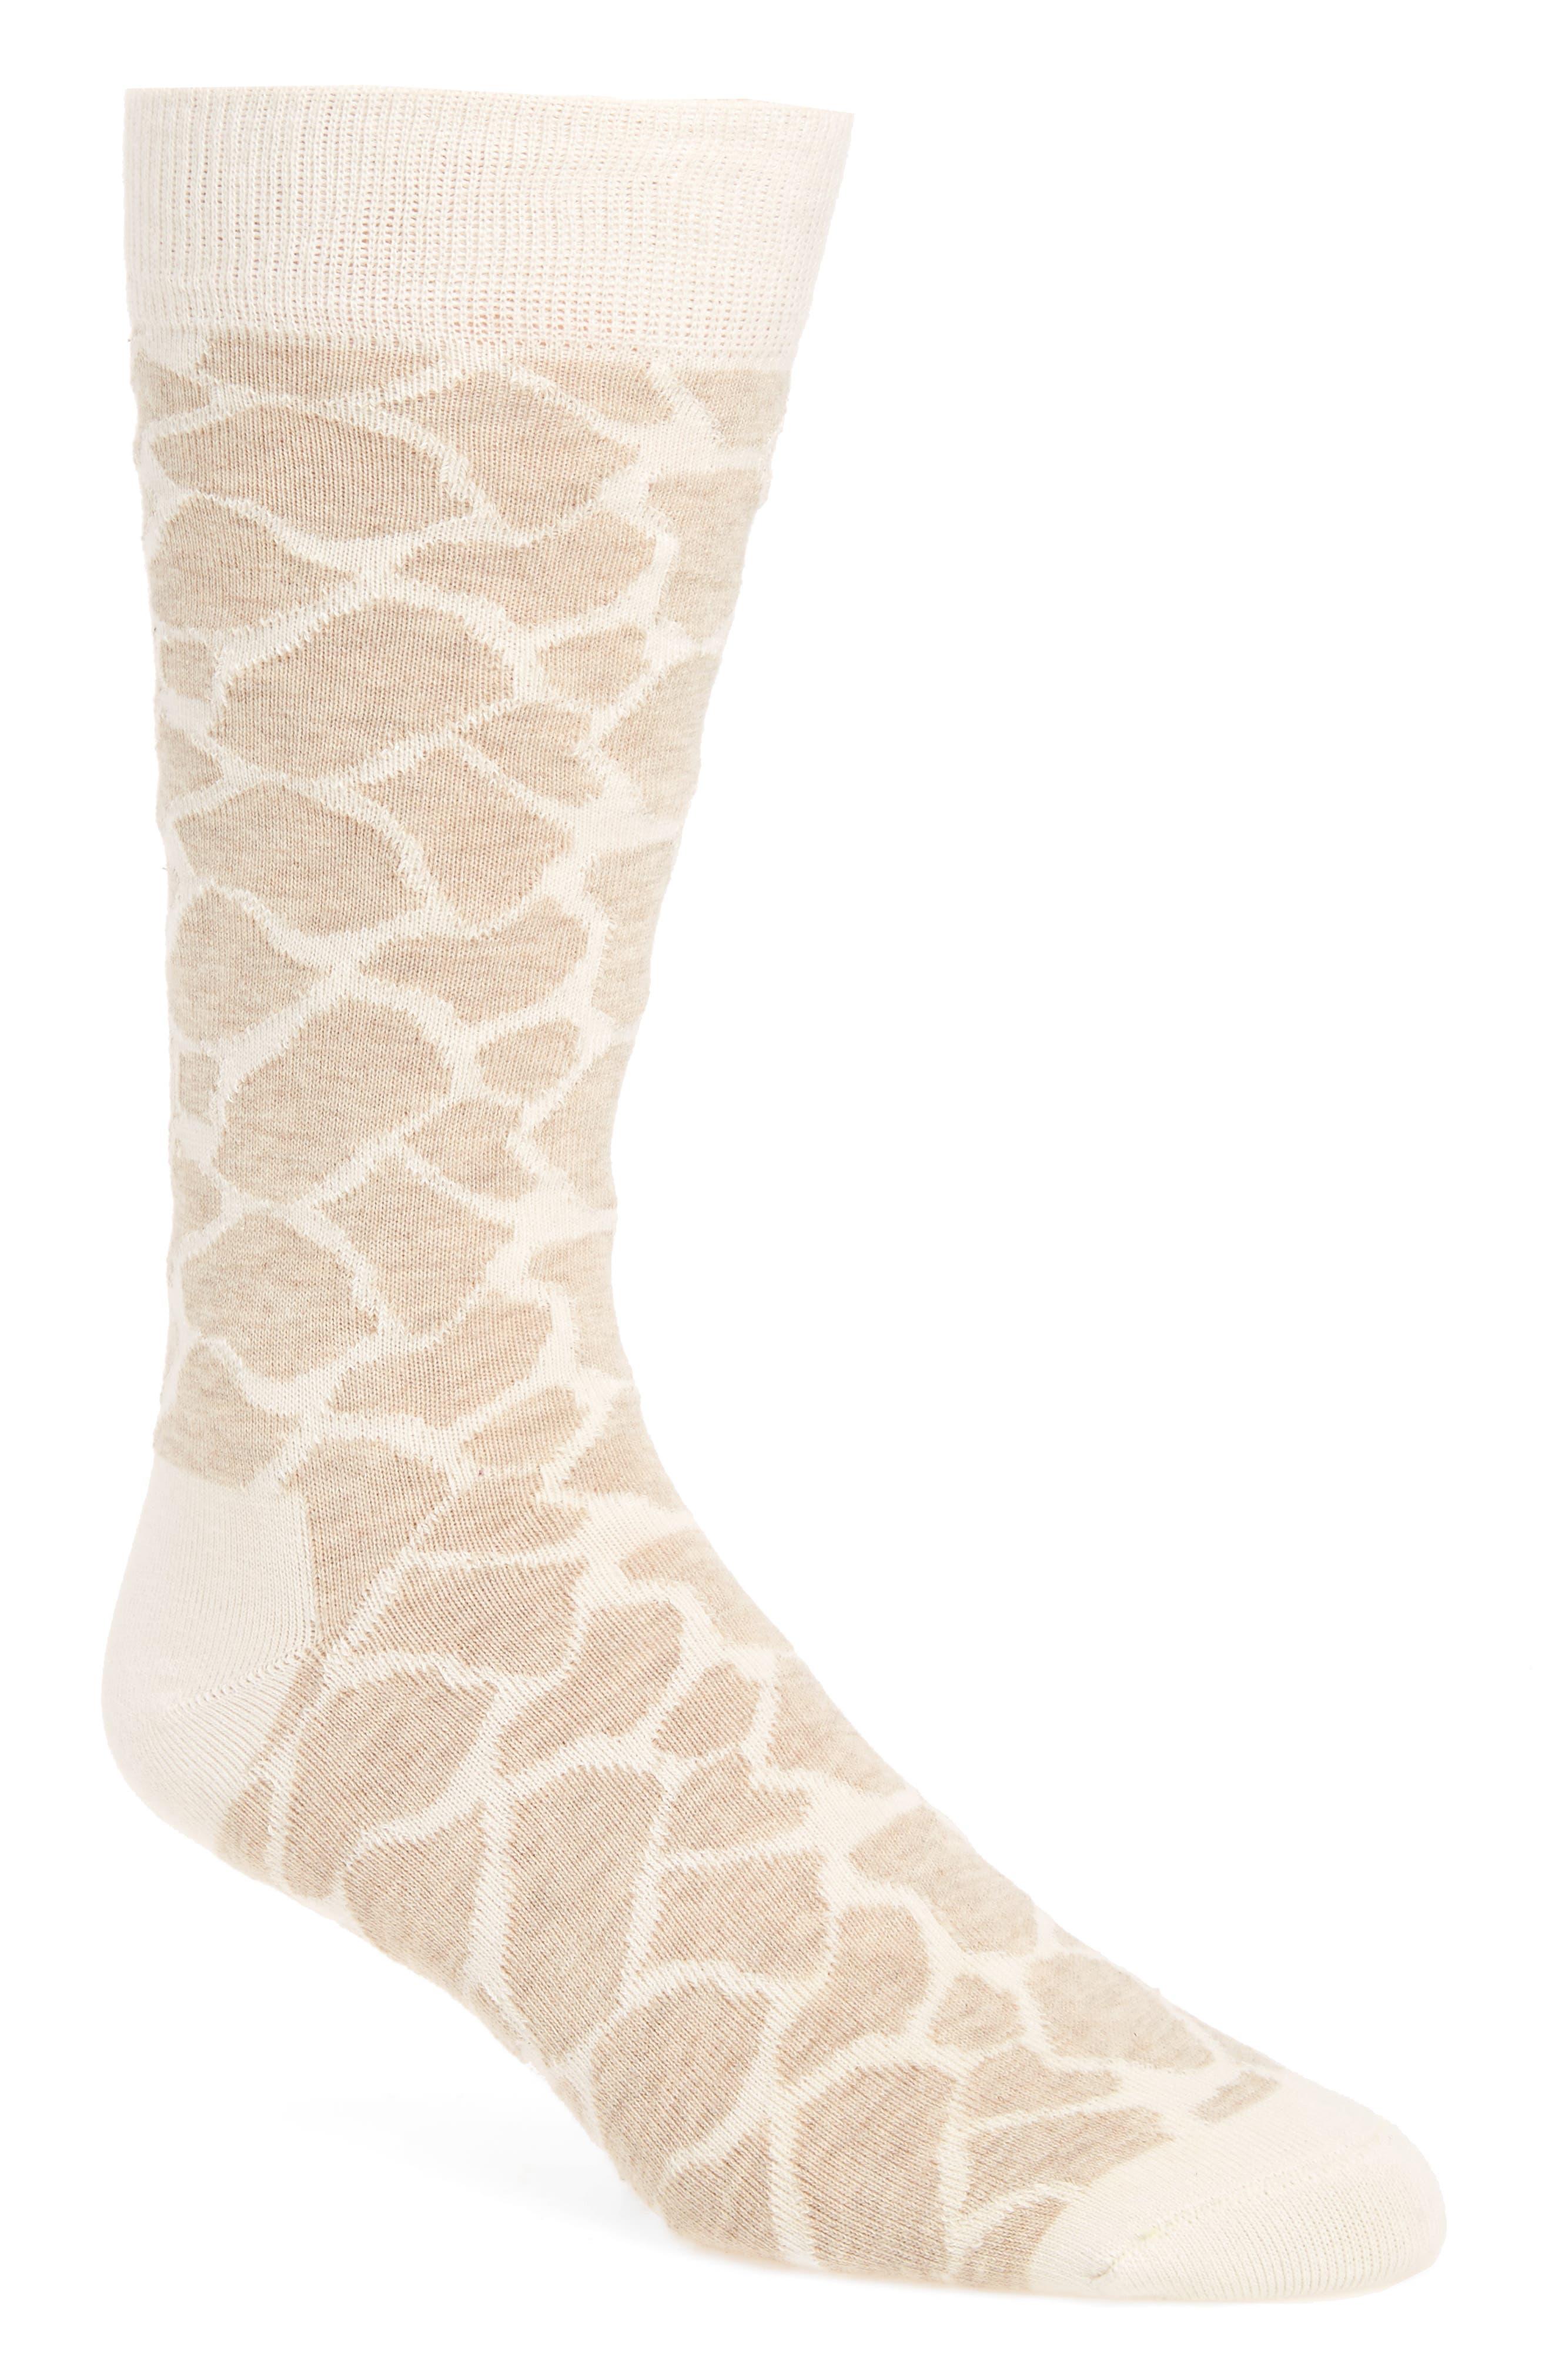 Giraffe Print Socks,                             Main thumbnail 1, color,